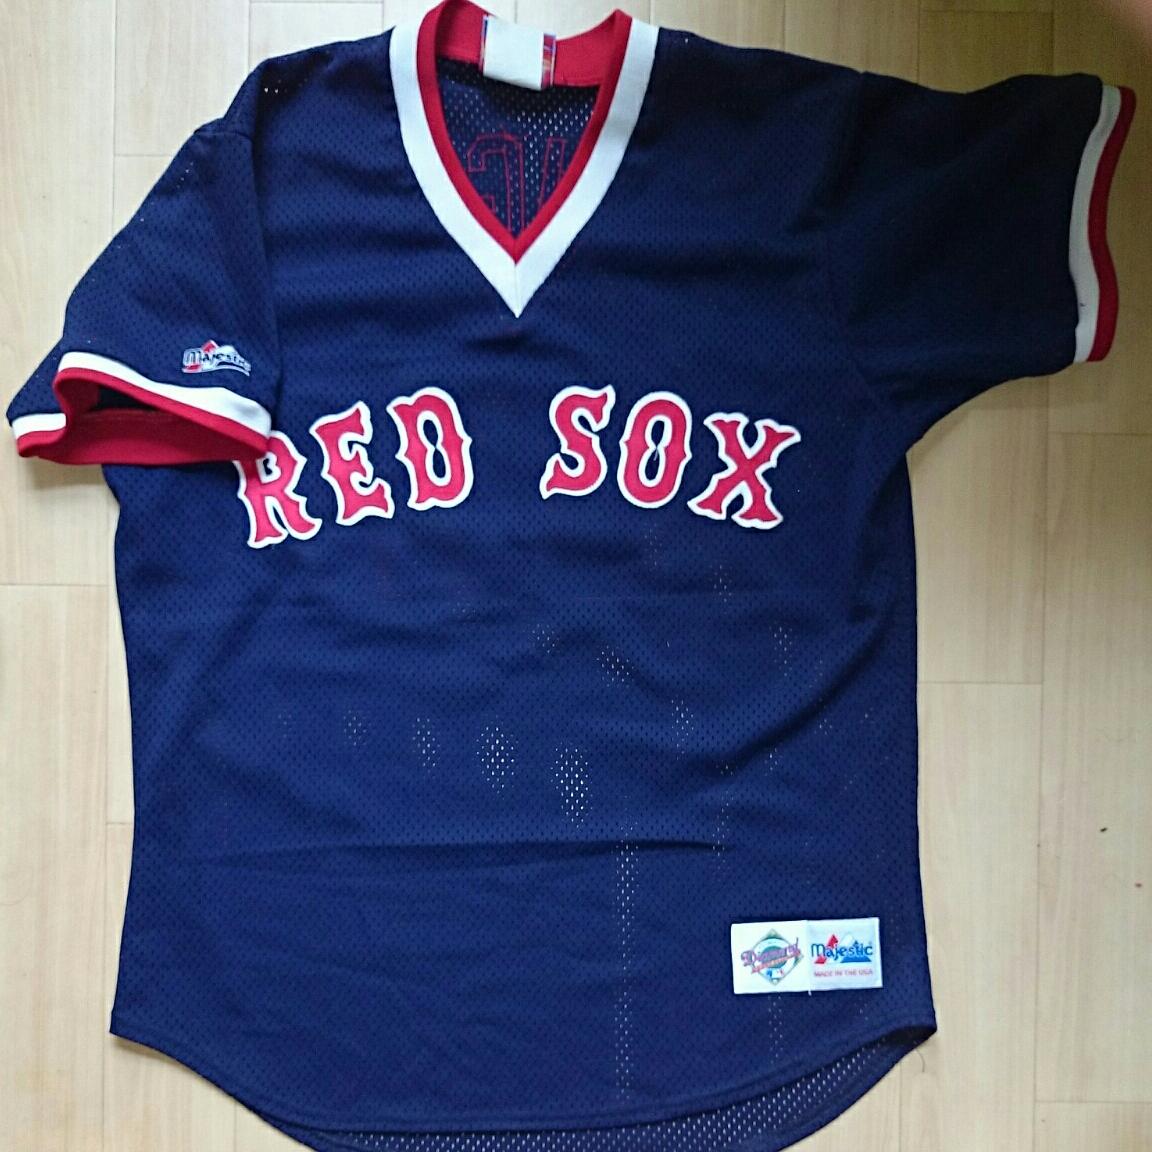 ★MO VAUGHN JERSEY ユニフォーム BOSTON RED SOX ボストン レッドソックス モー ボーン ヴォーン MLB メジャーリーグ 大リーグ MAJESTIC_画像1